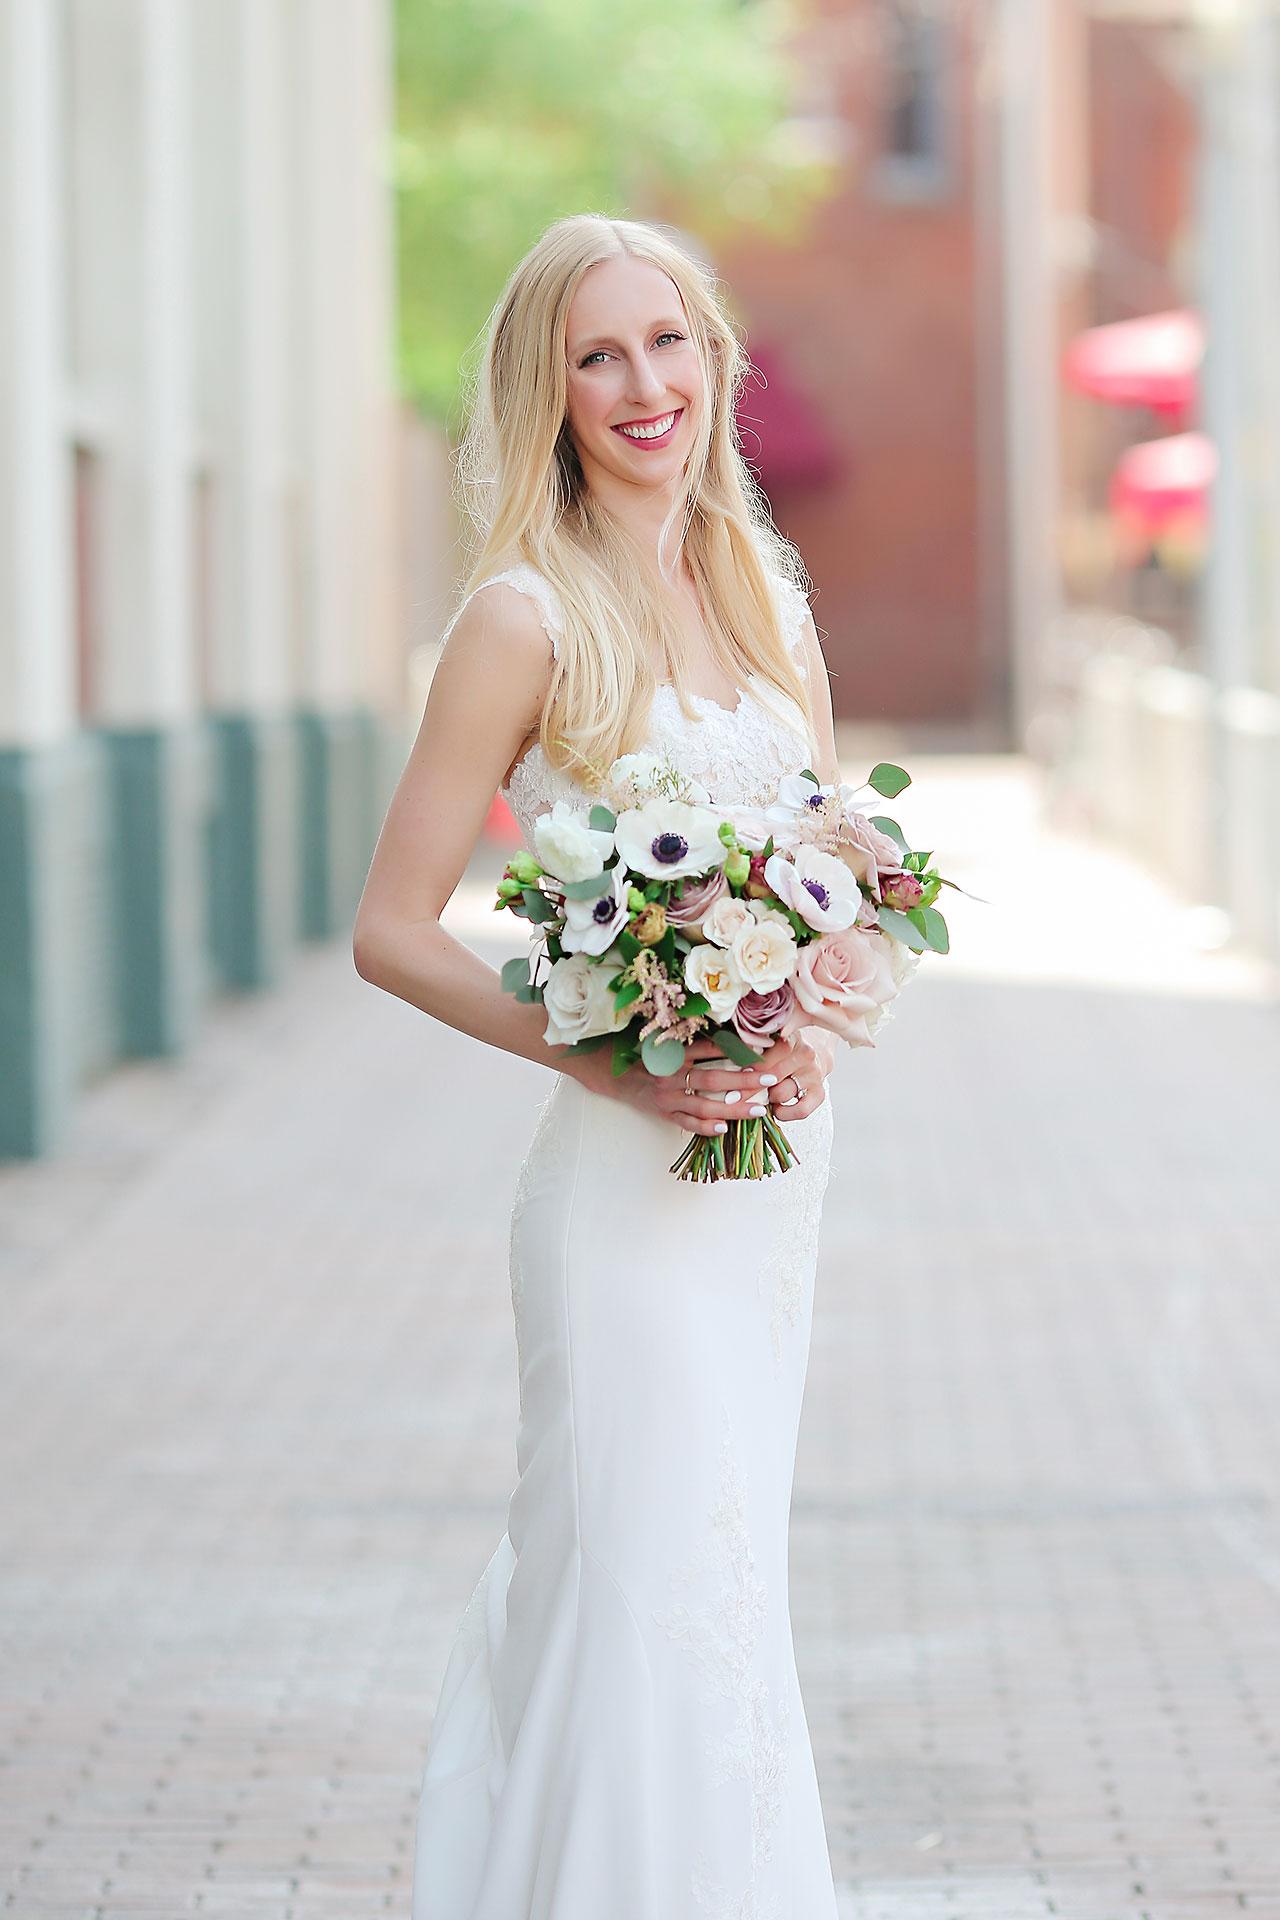 Molly Declan Scottish Rite Indianapolis Wedding 086